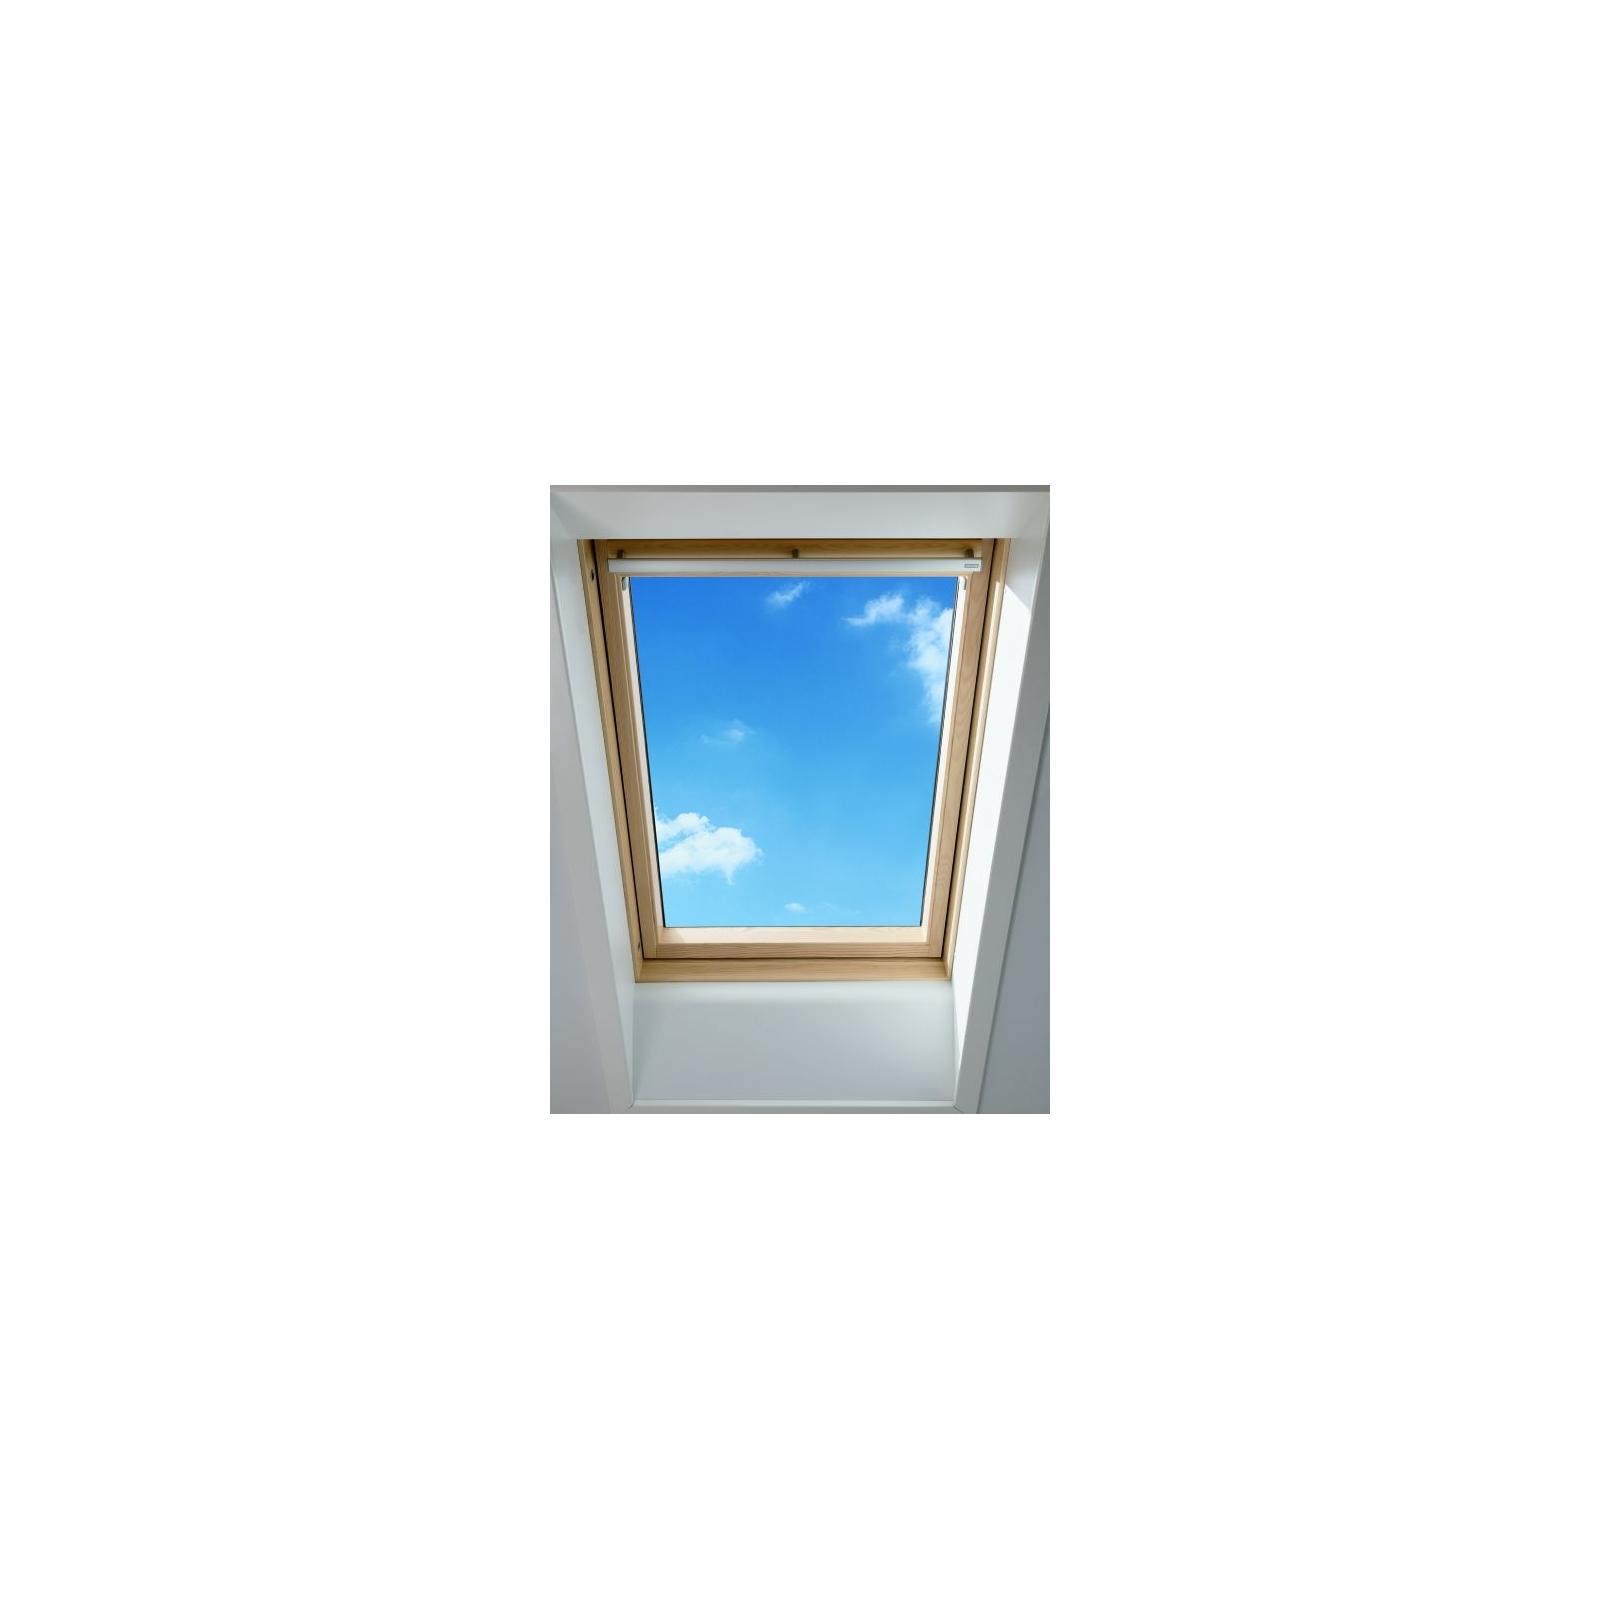 velux raam ggl ck04 55x98 cm 2050 fsc wit bouwcenter koolschijn. Black Bedroom Furniture Sets. Home Design Ideas